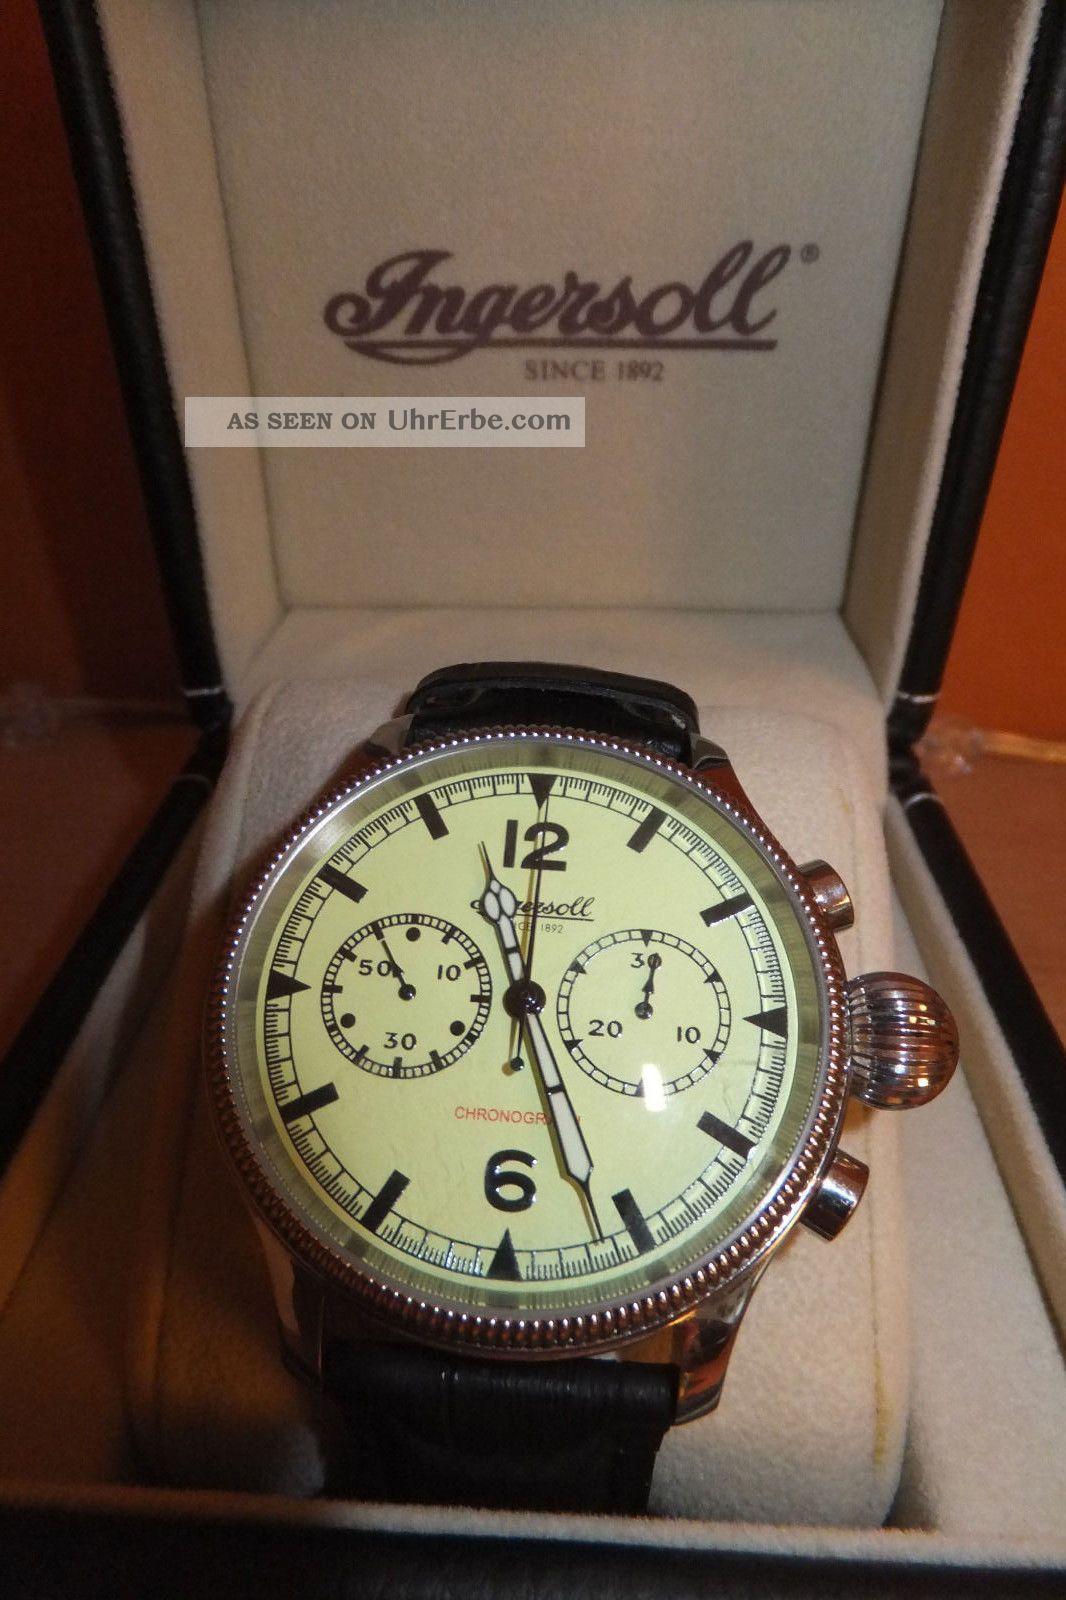 Ingersoll Wells Fargo Chronograph Ref.  In 4600 Gr Limited Edition Armbanduhren Bild